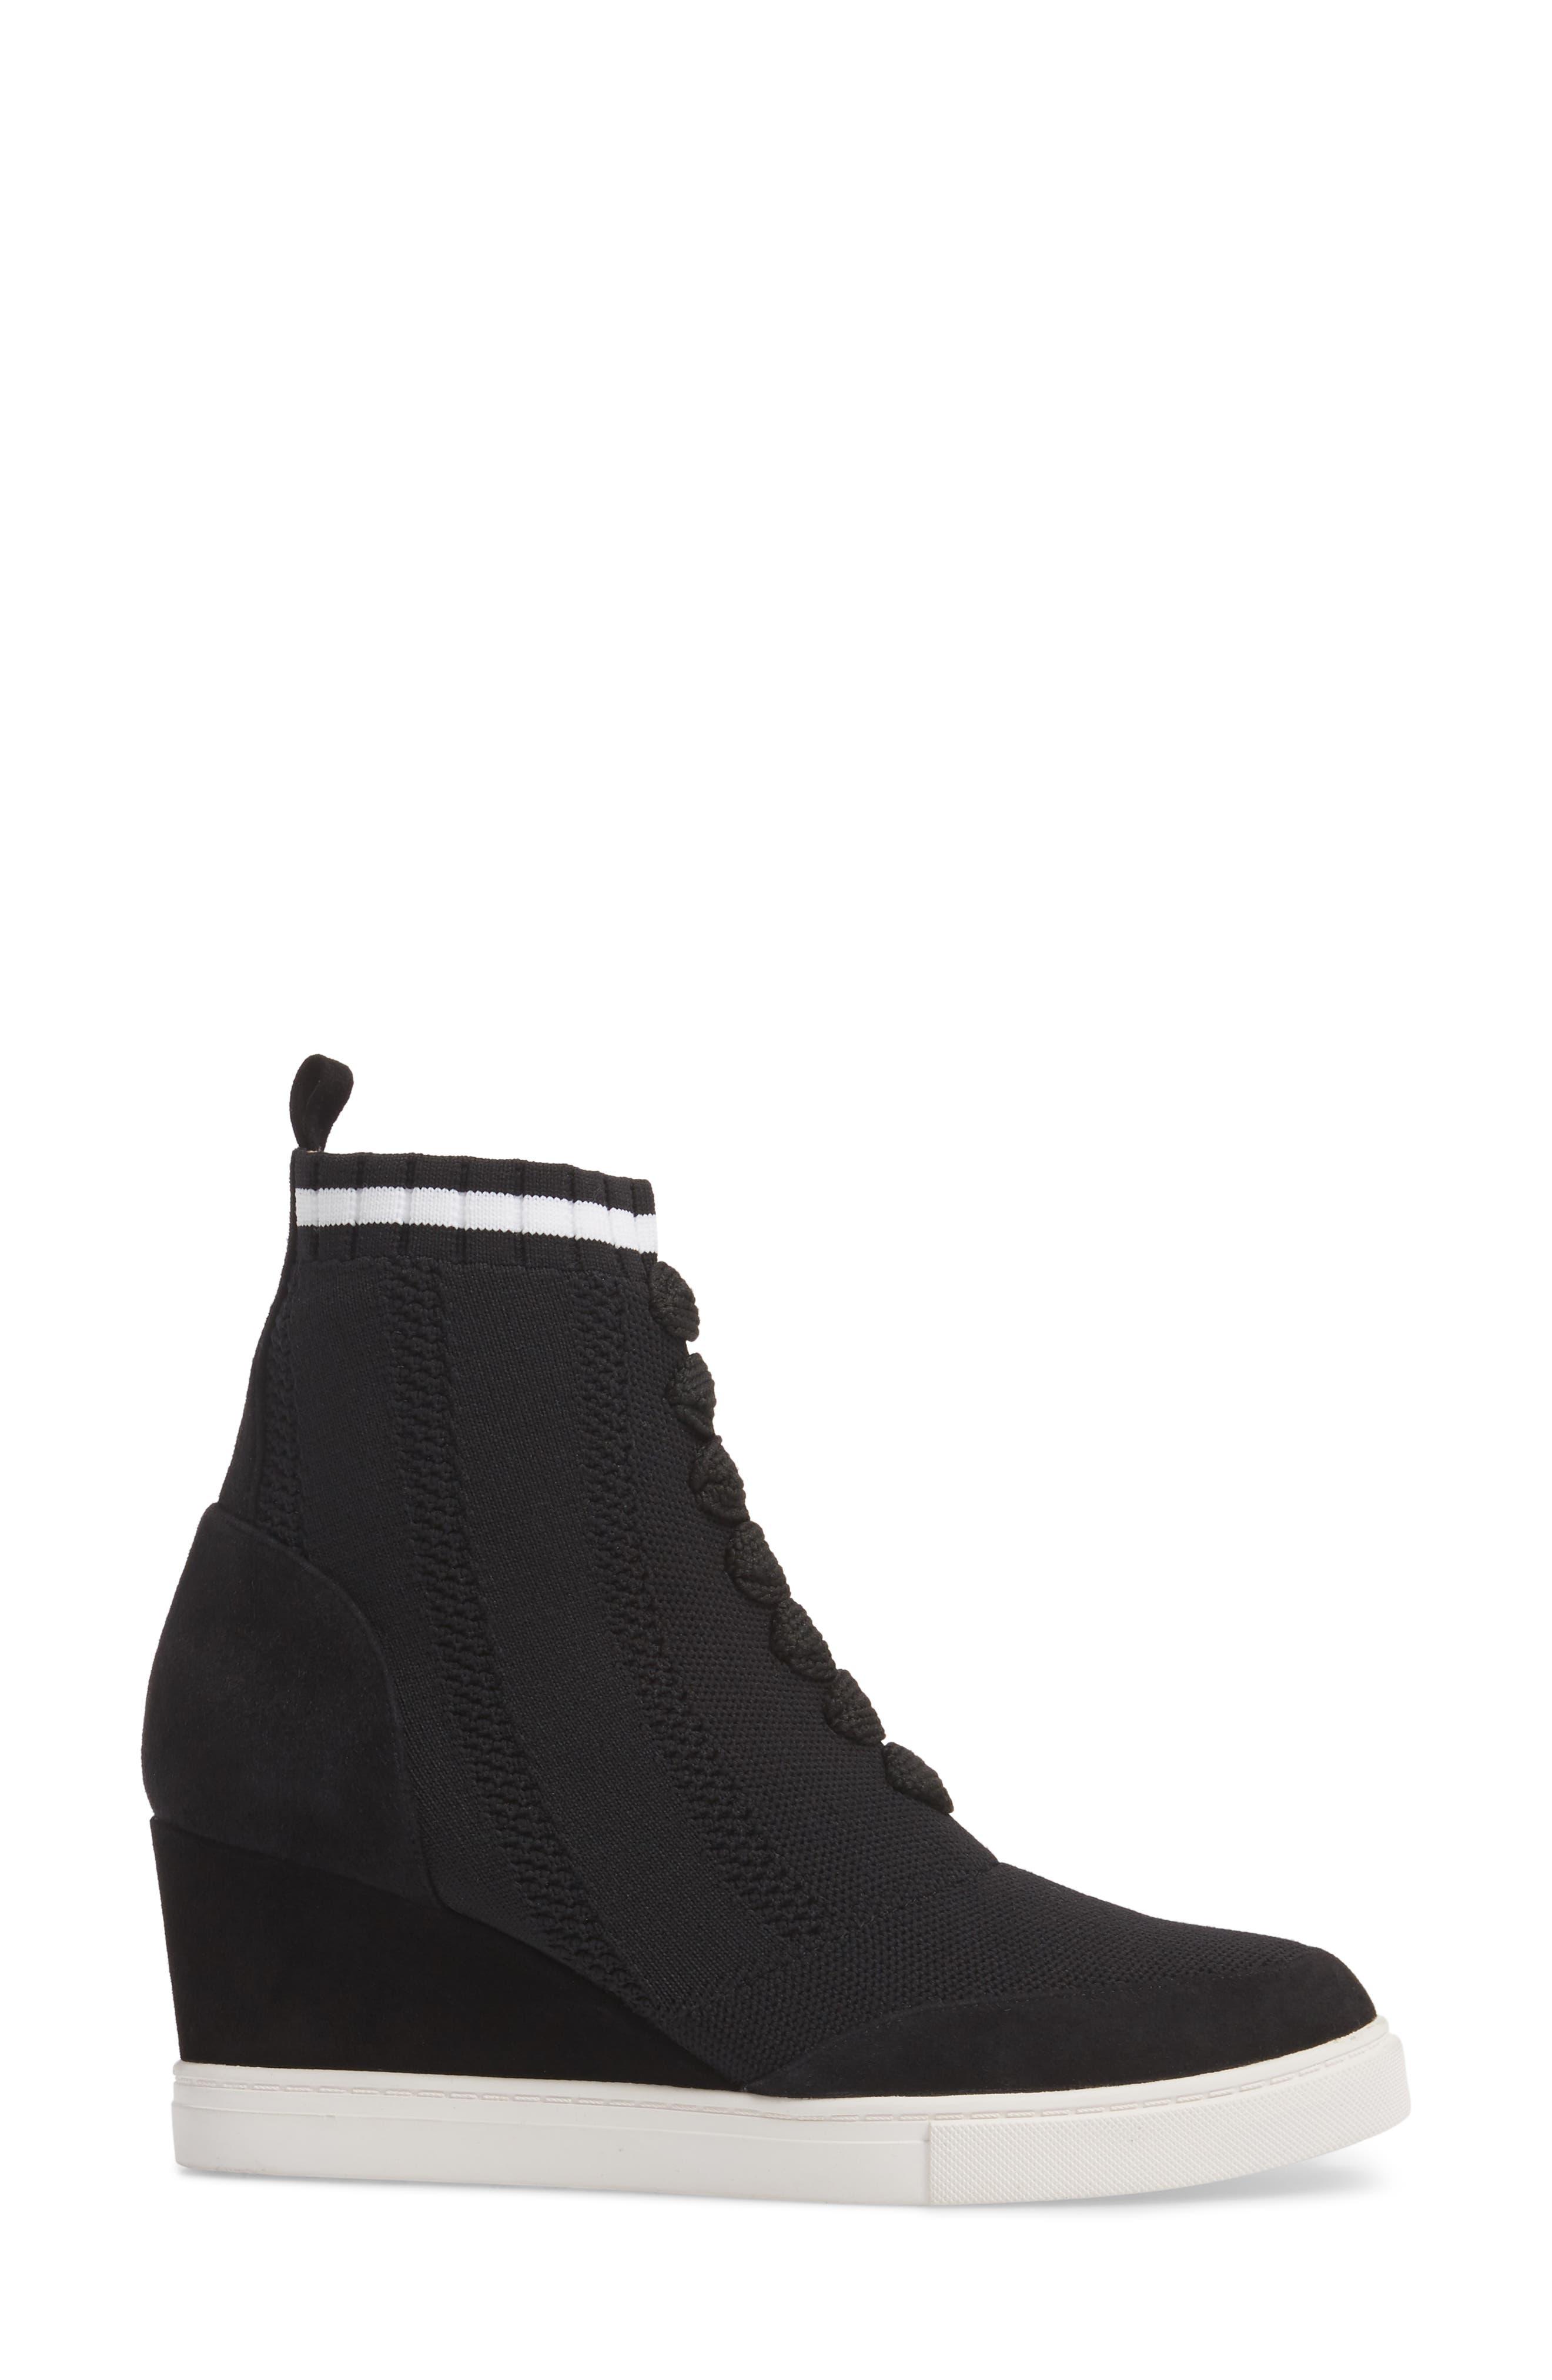 Fabiana Wedge Sneaker,                             Alternate thumbnail 3, color,                             BLACK SUEDE